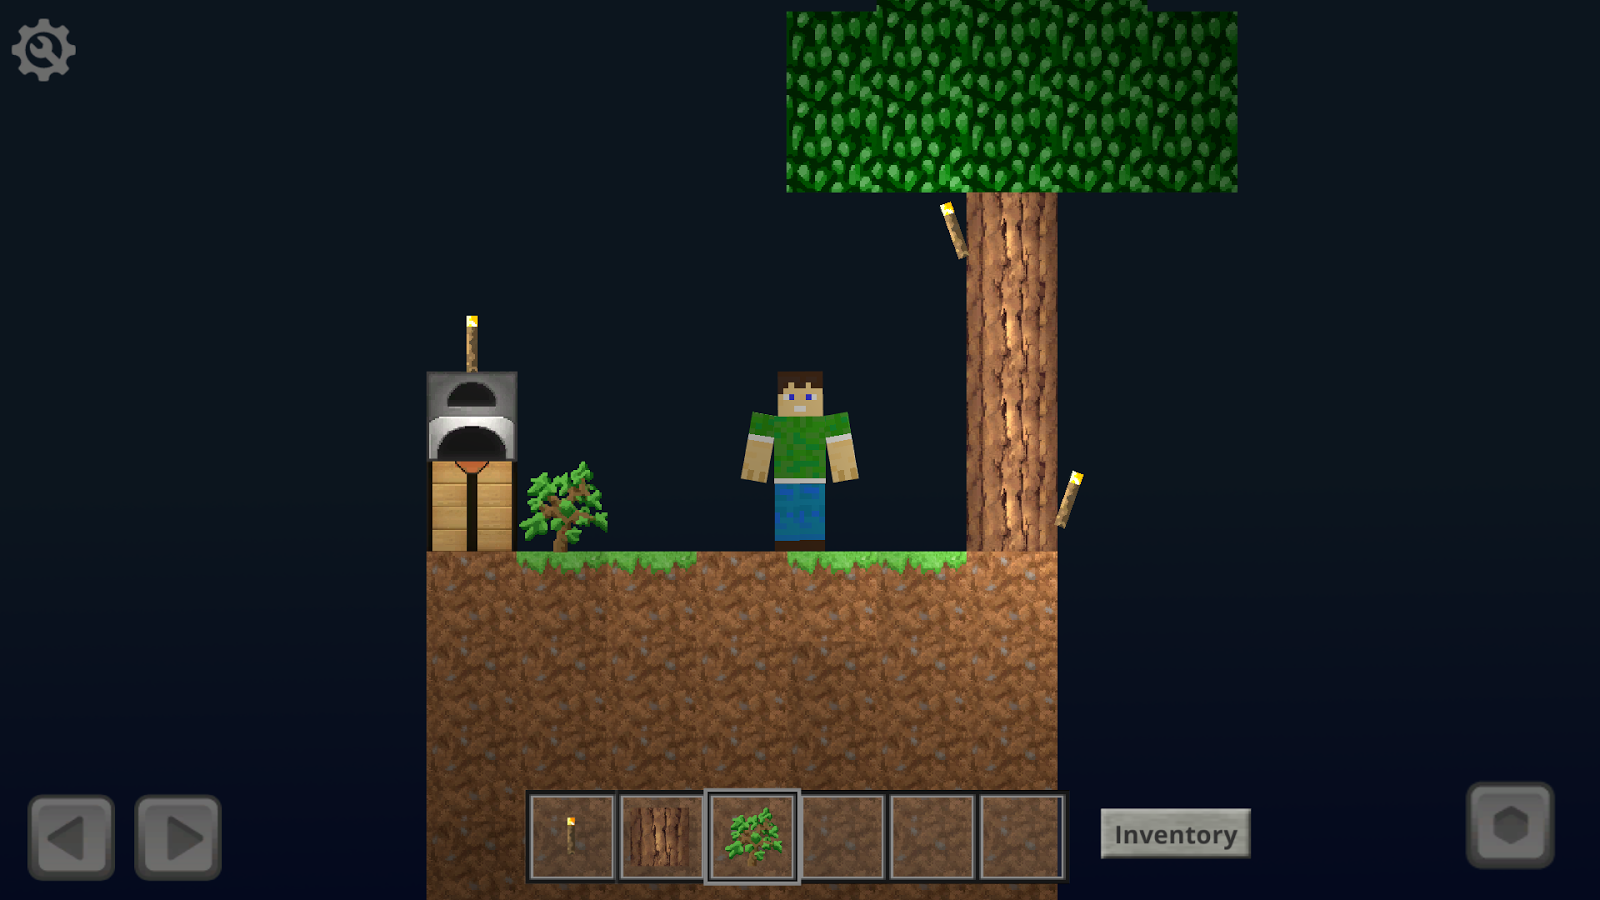 Uncategorized Skyland Games skyland android apps on google play screenshot